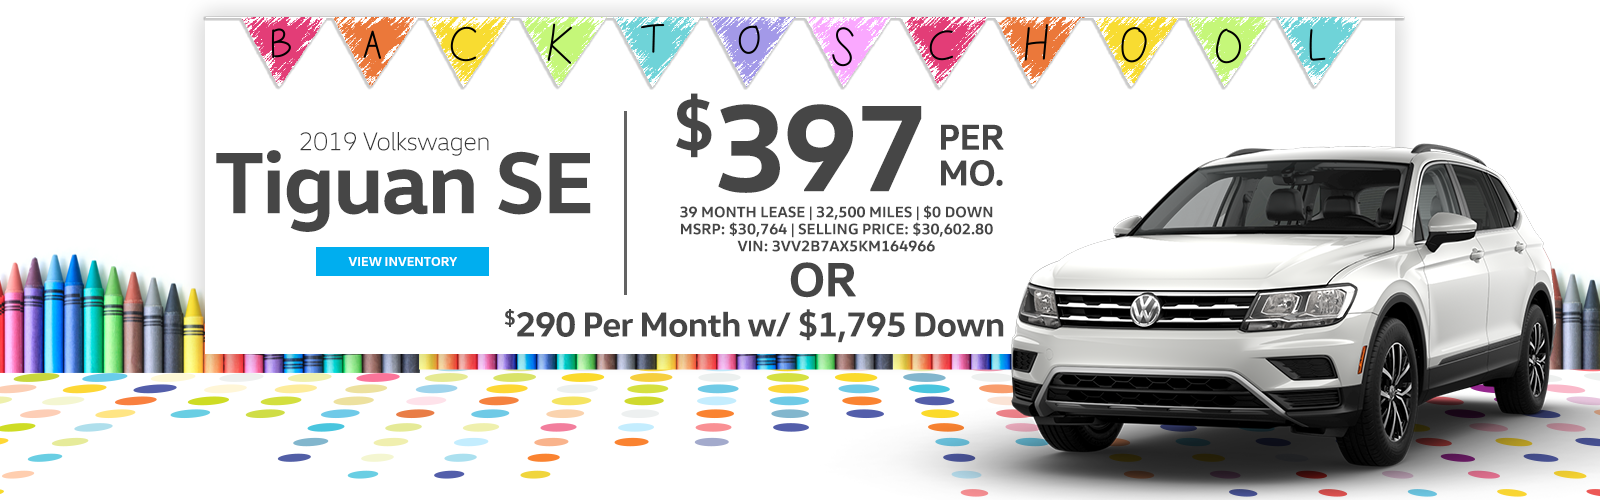 Ide VW of East Rochester | Volkswagen Dealer in Rochester, NY